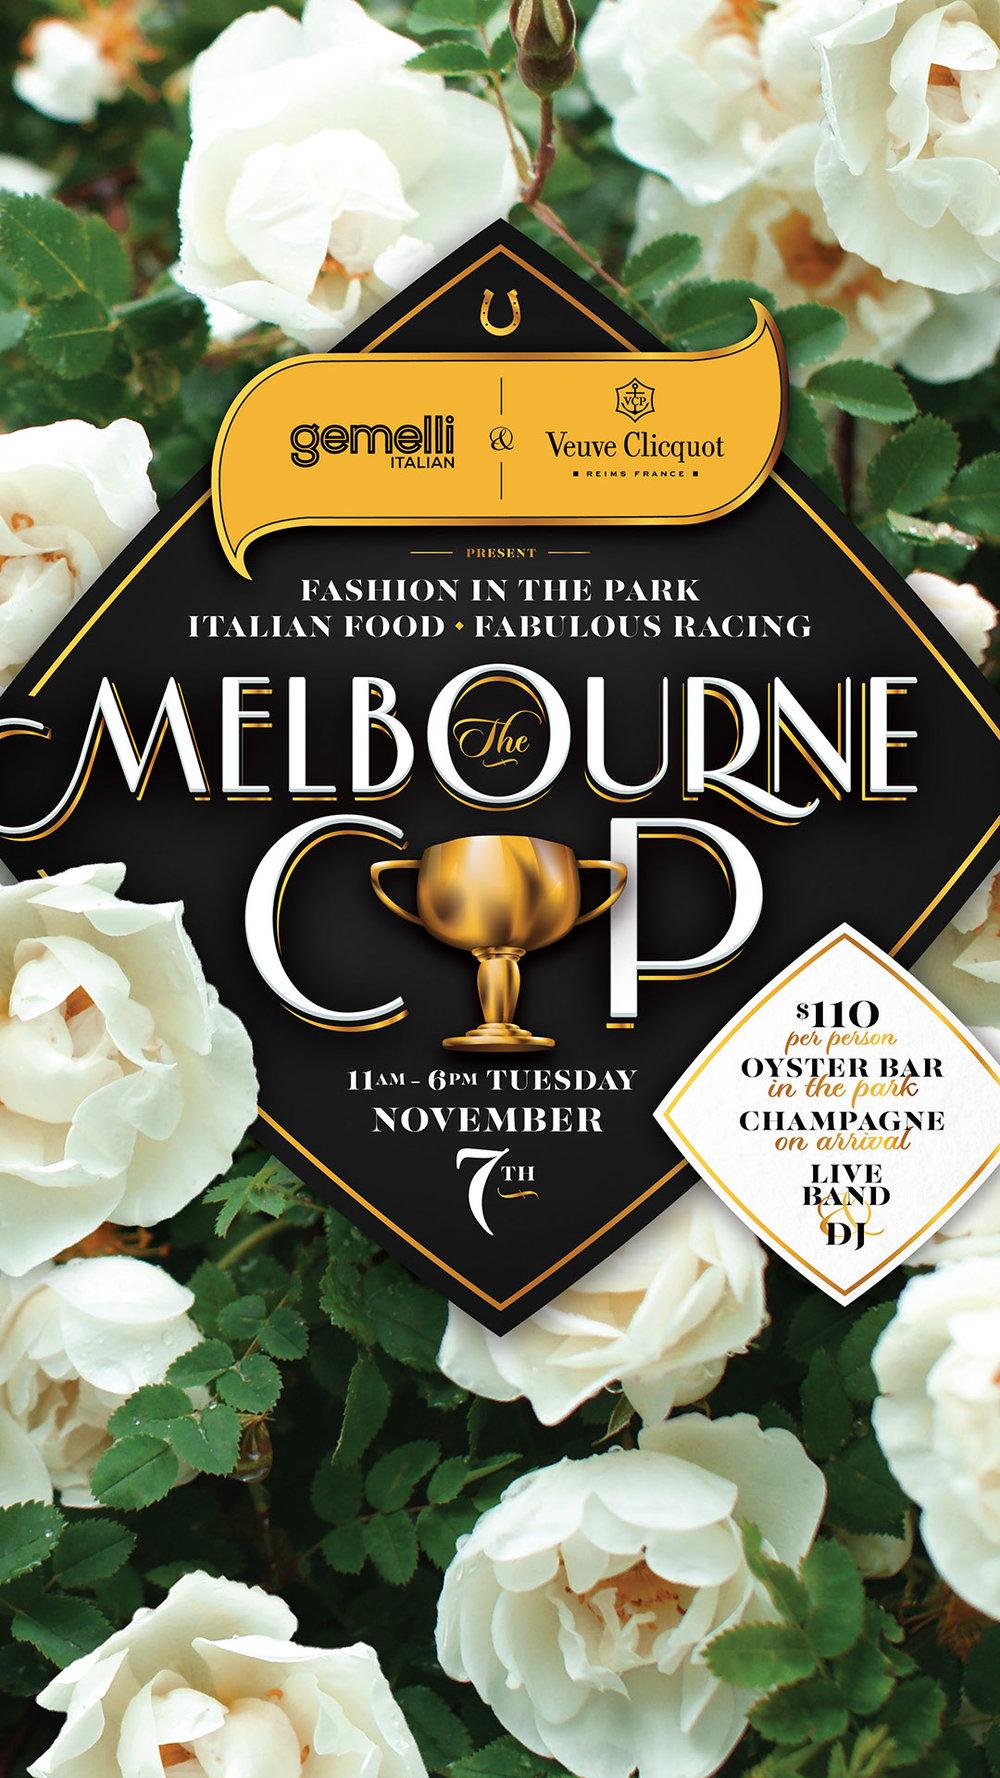 Gemelli_Melbourne_Cup_2017_1080x1920.jpg